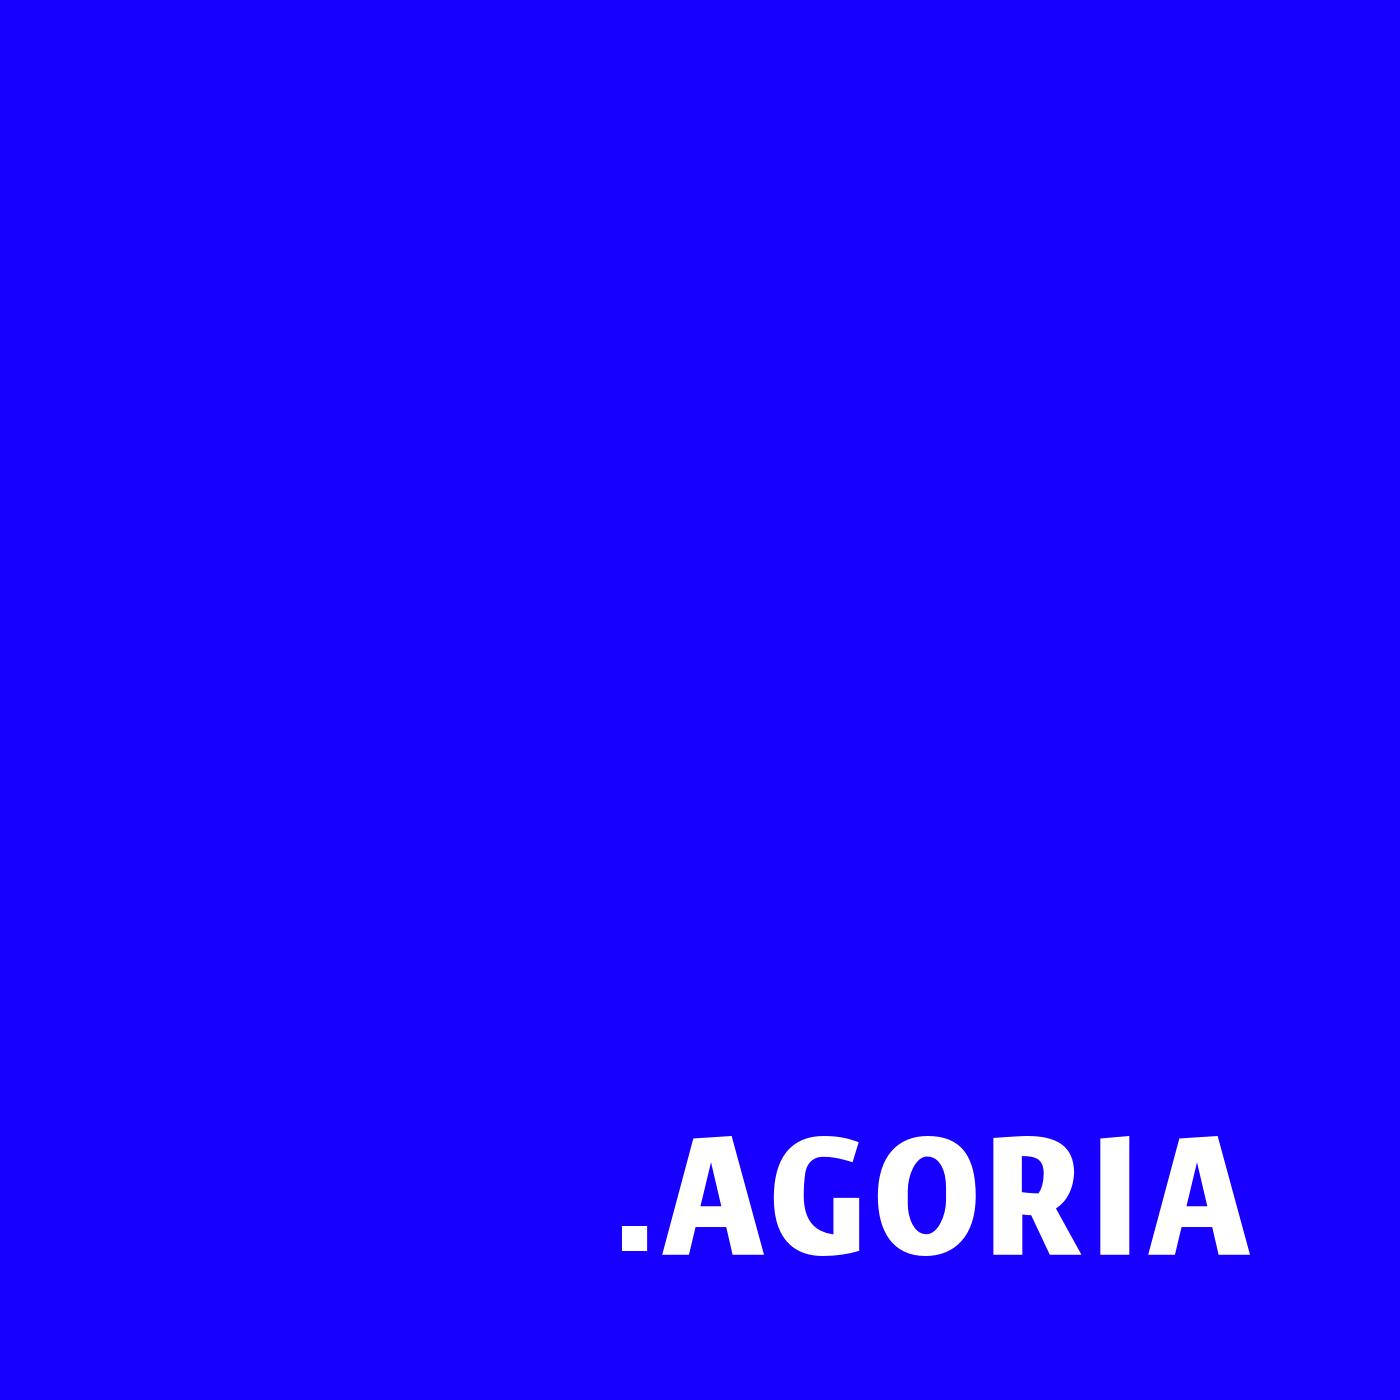 Agoria logo